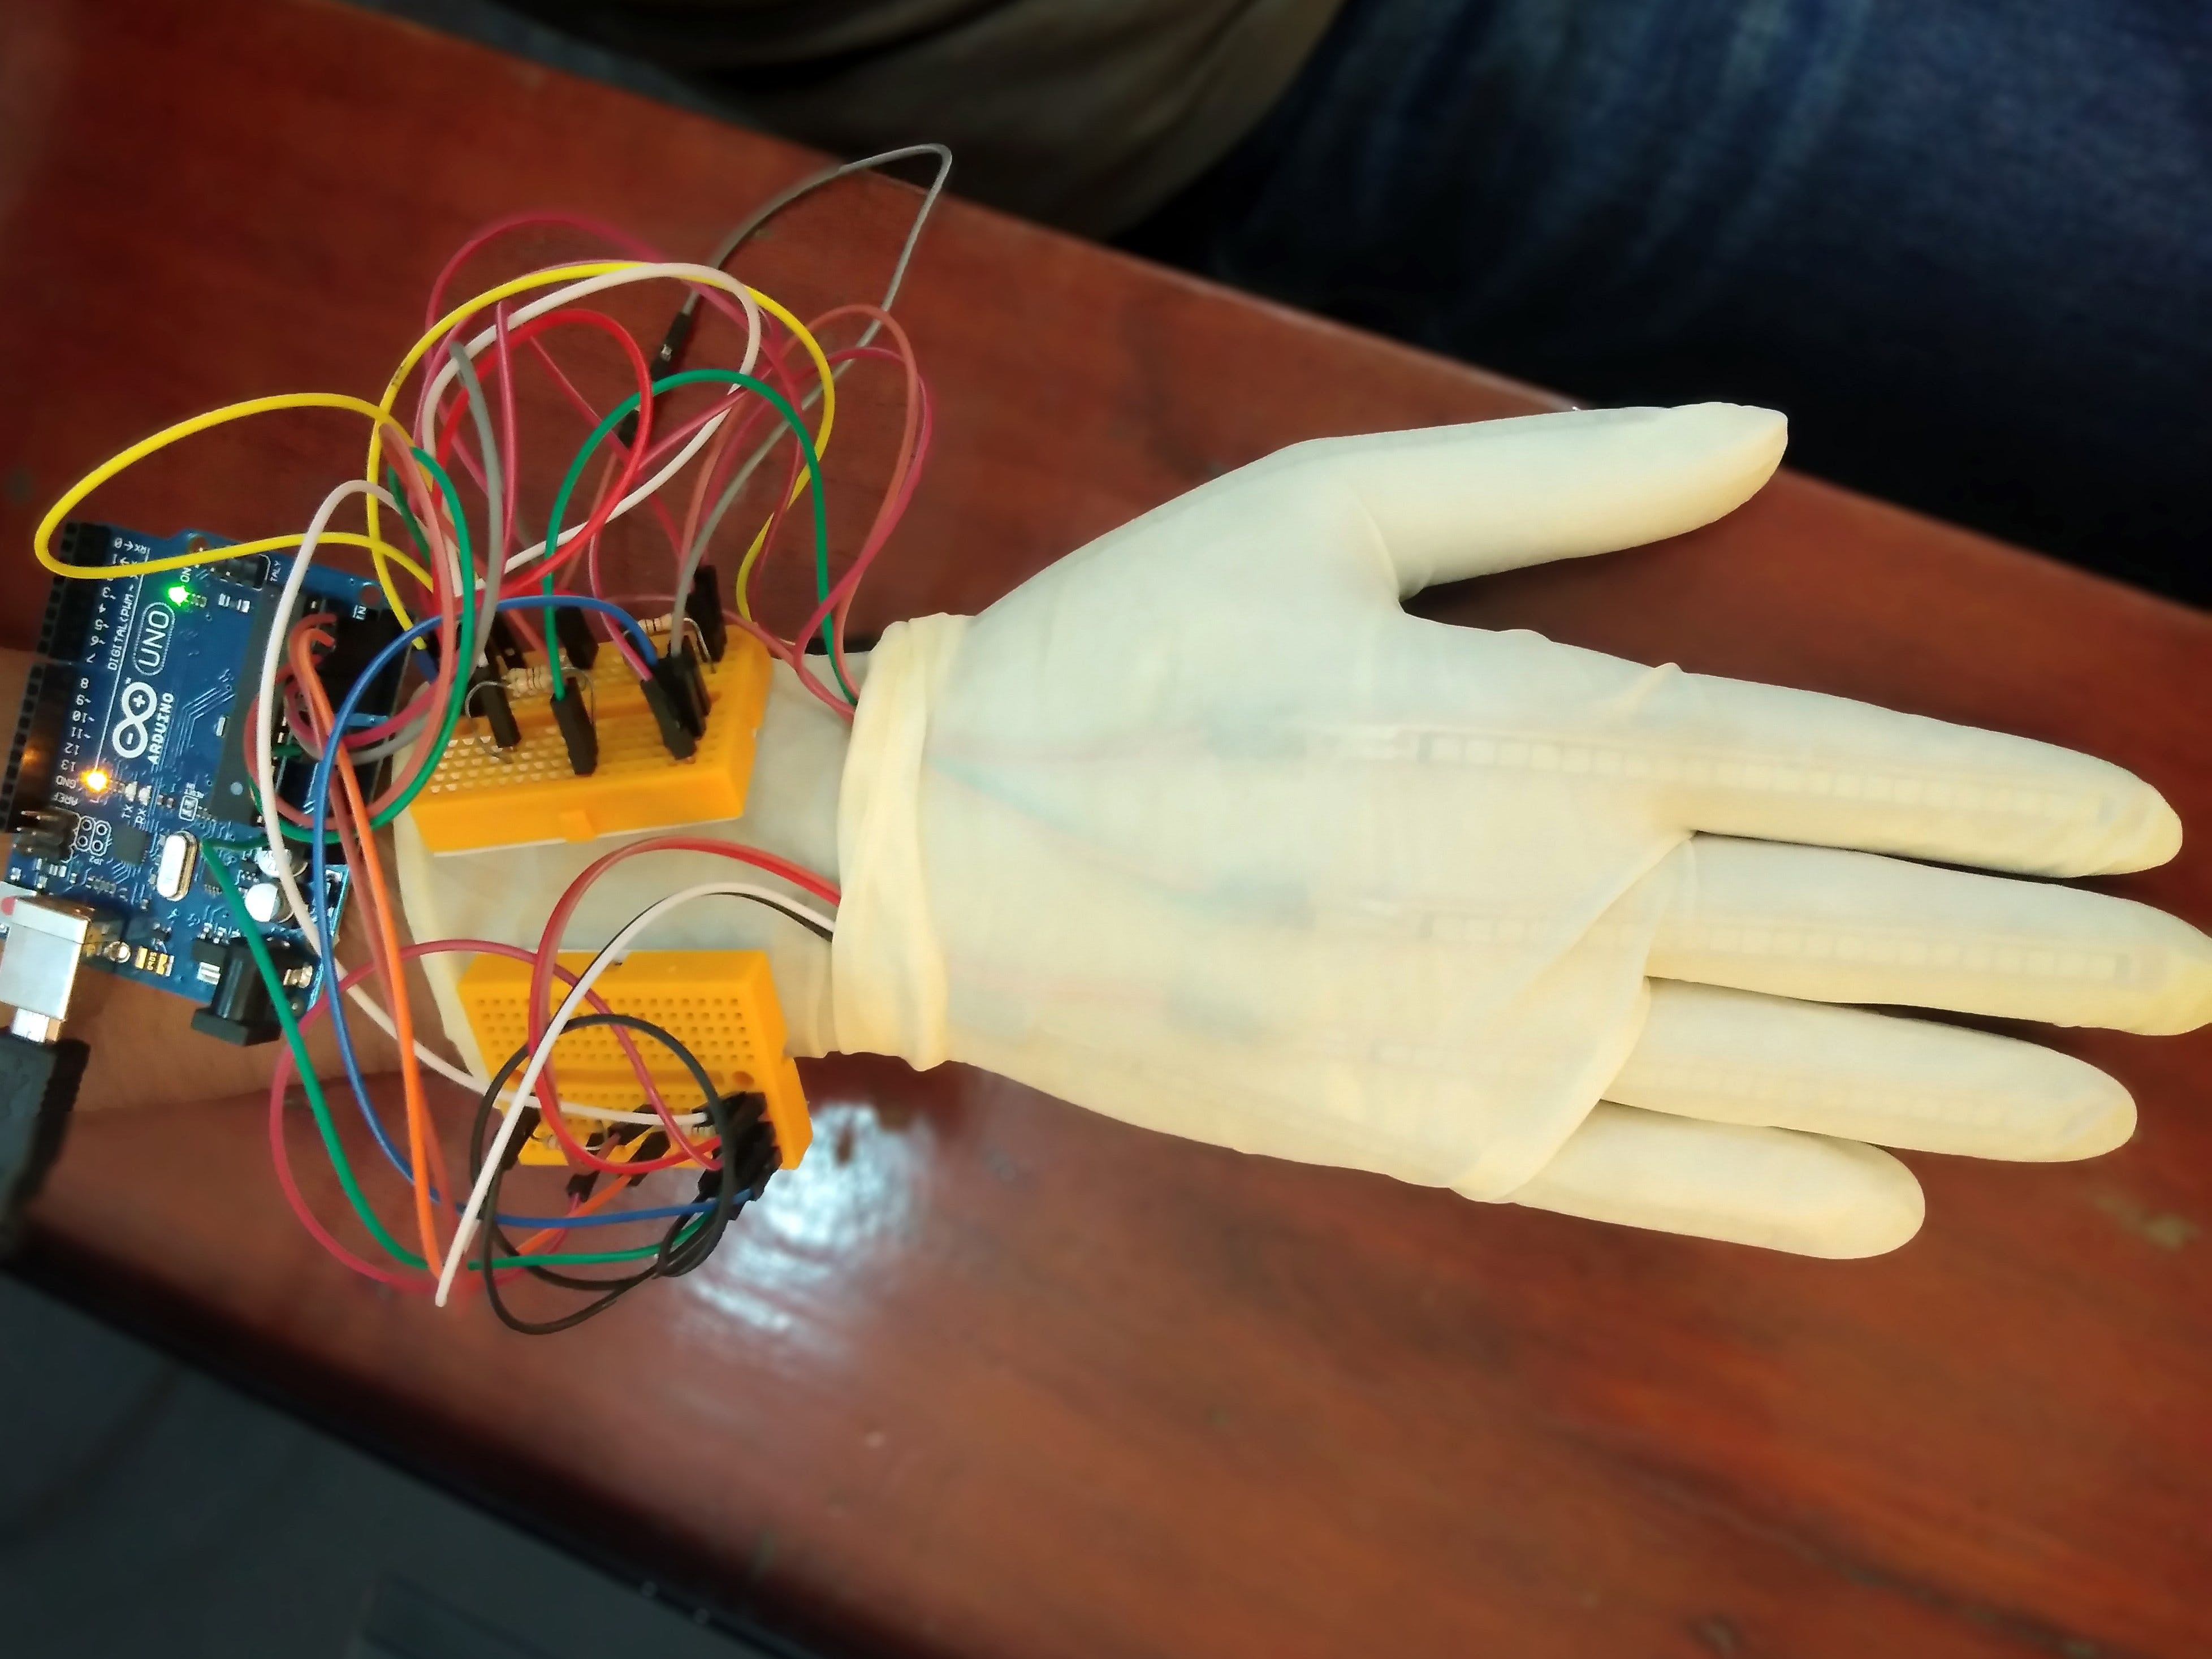 Alexa at Your Fingertips